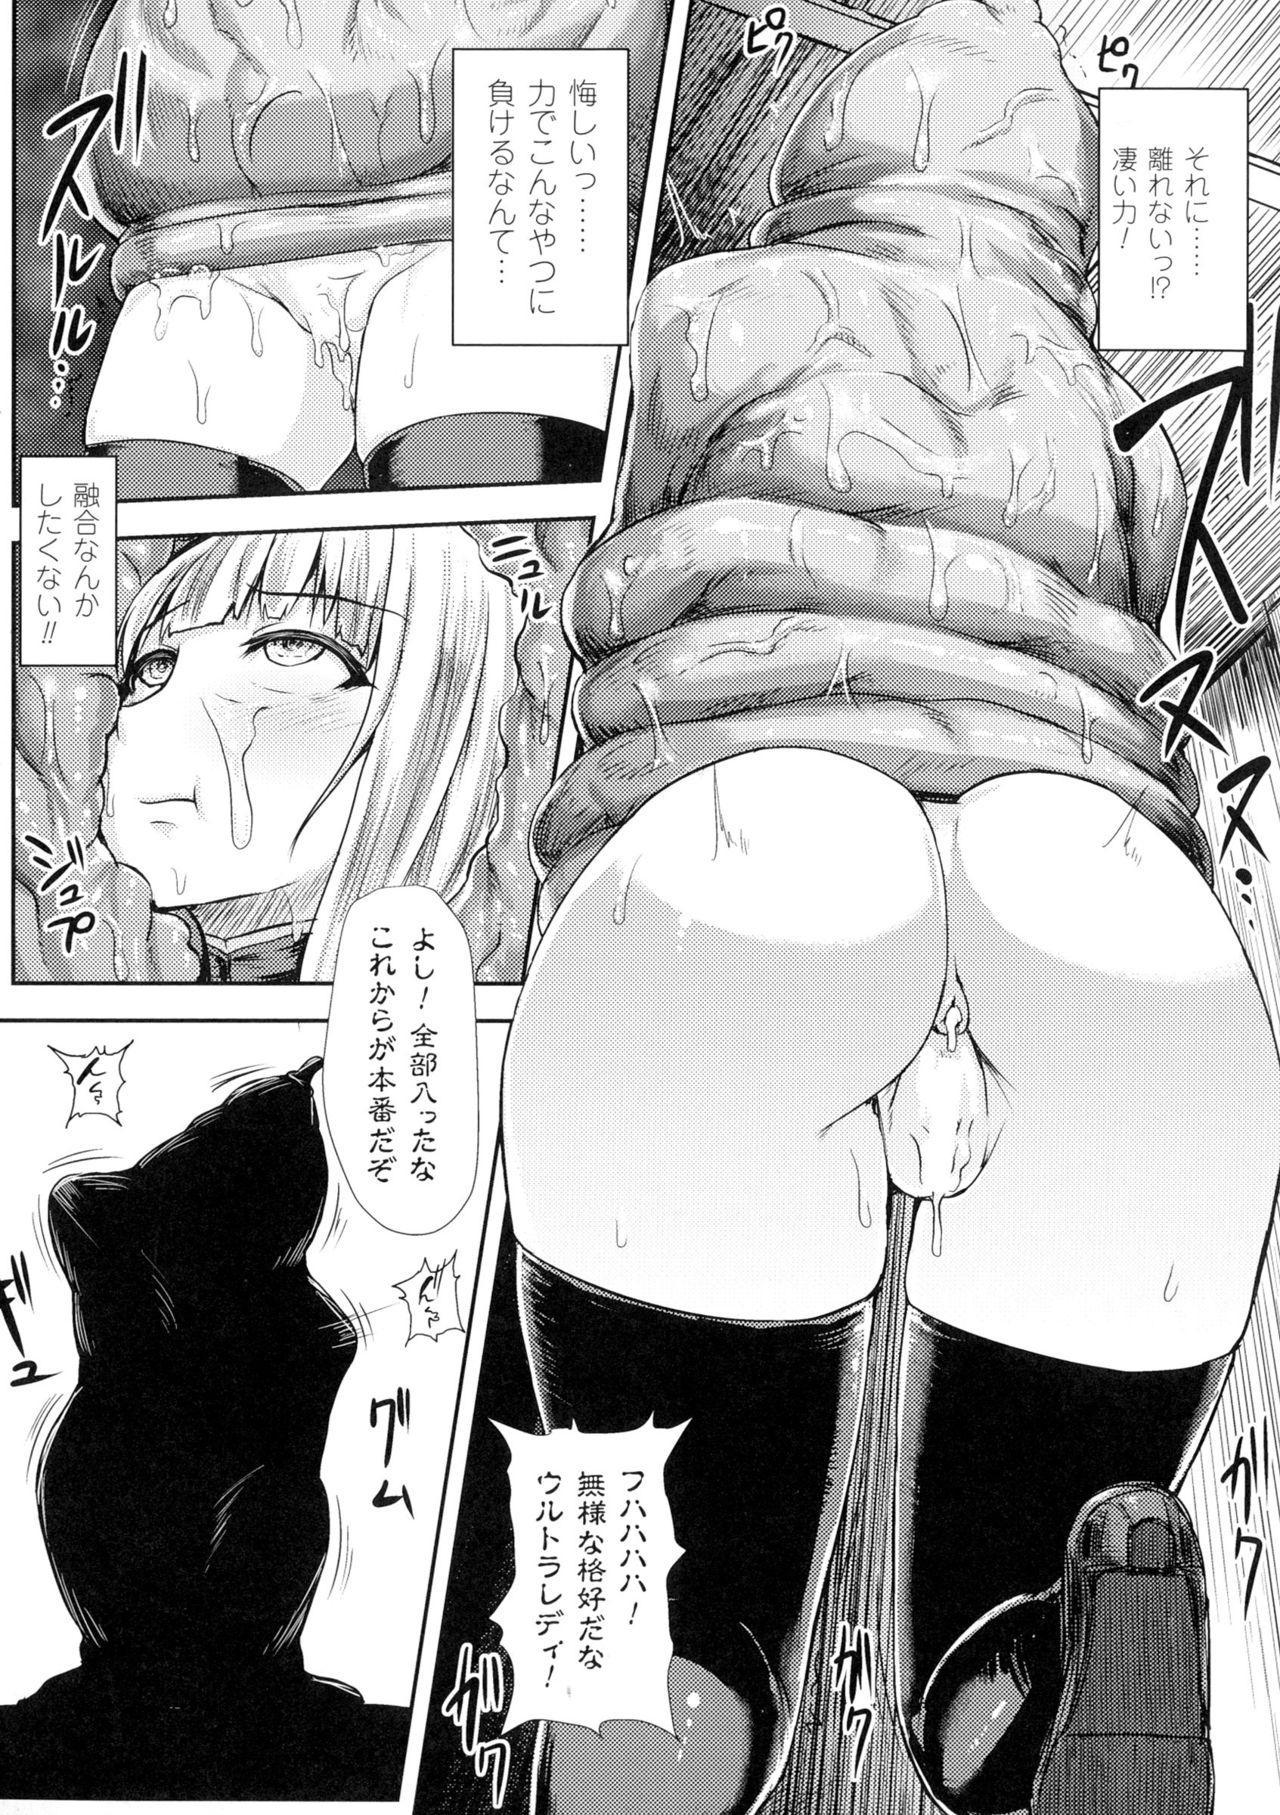 Seigi no Heroine Kangoku File DX Vol. 1 43